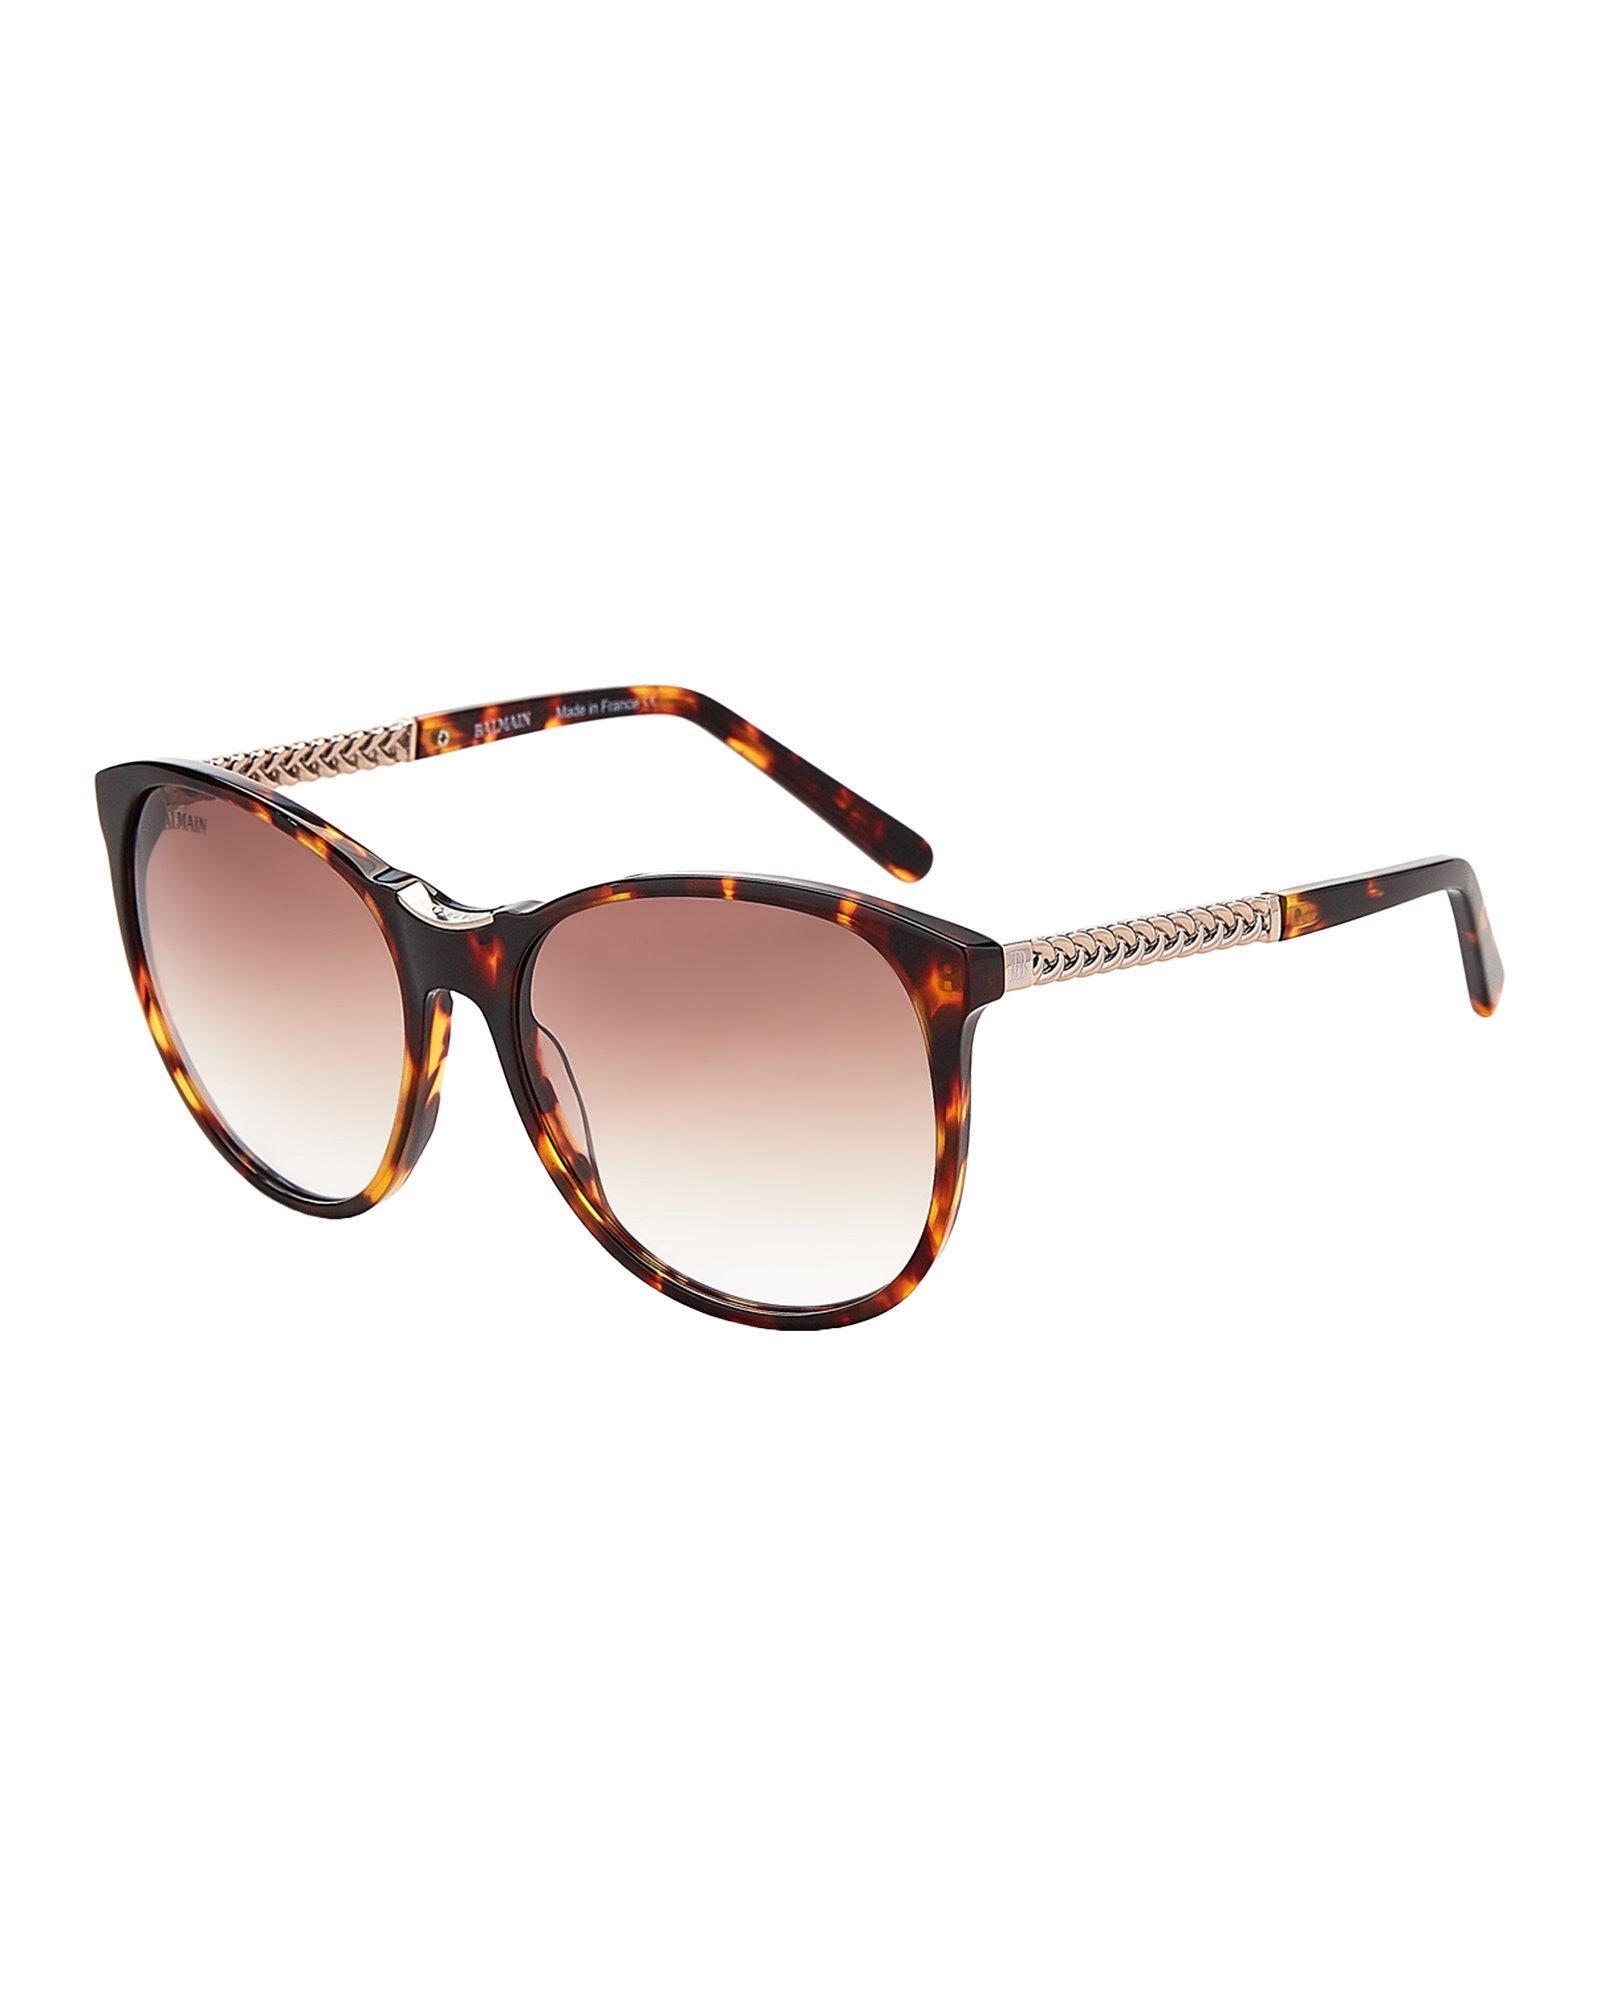 49296d4071 Lyst - Balmain Bl2070 Tortoiseshell-look Round Sunglasses in Brown